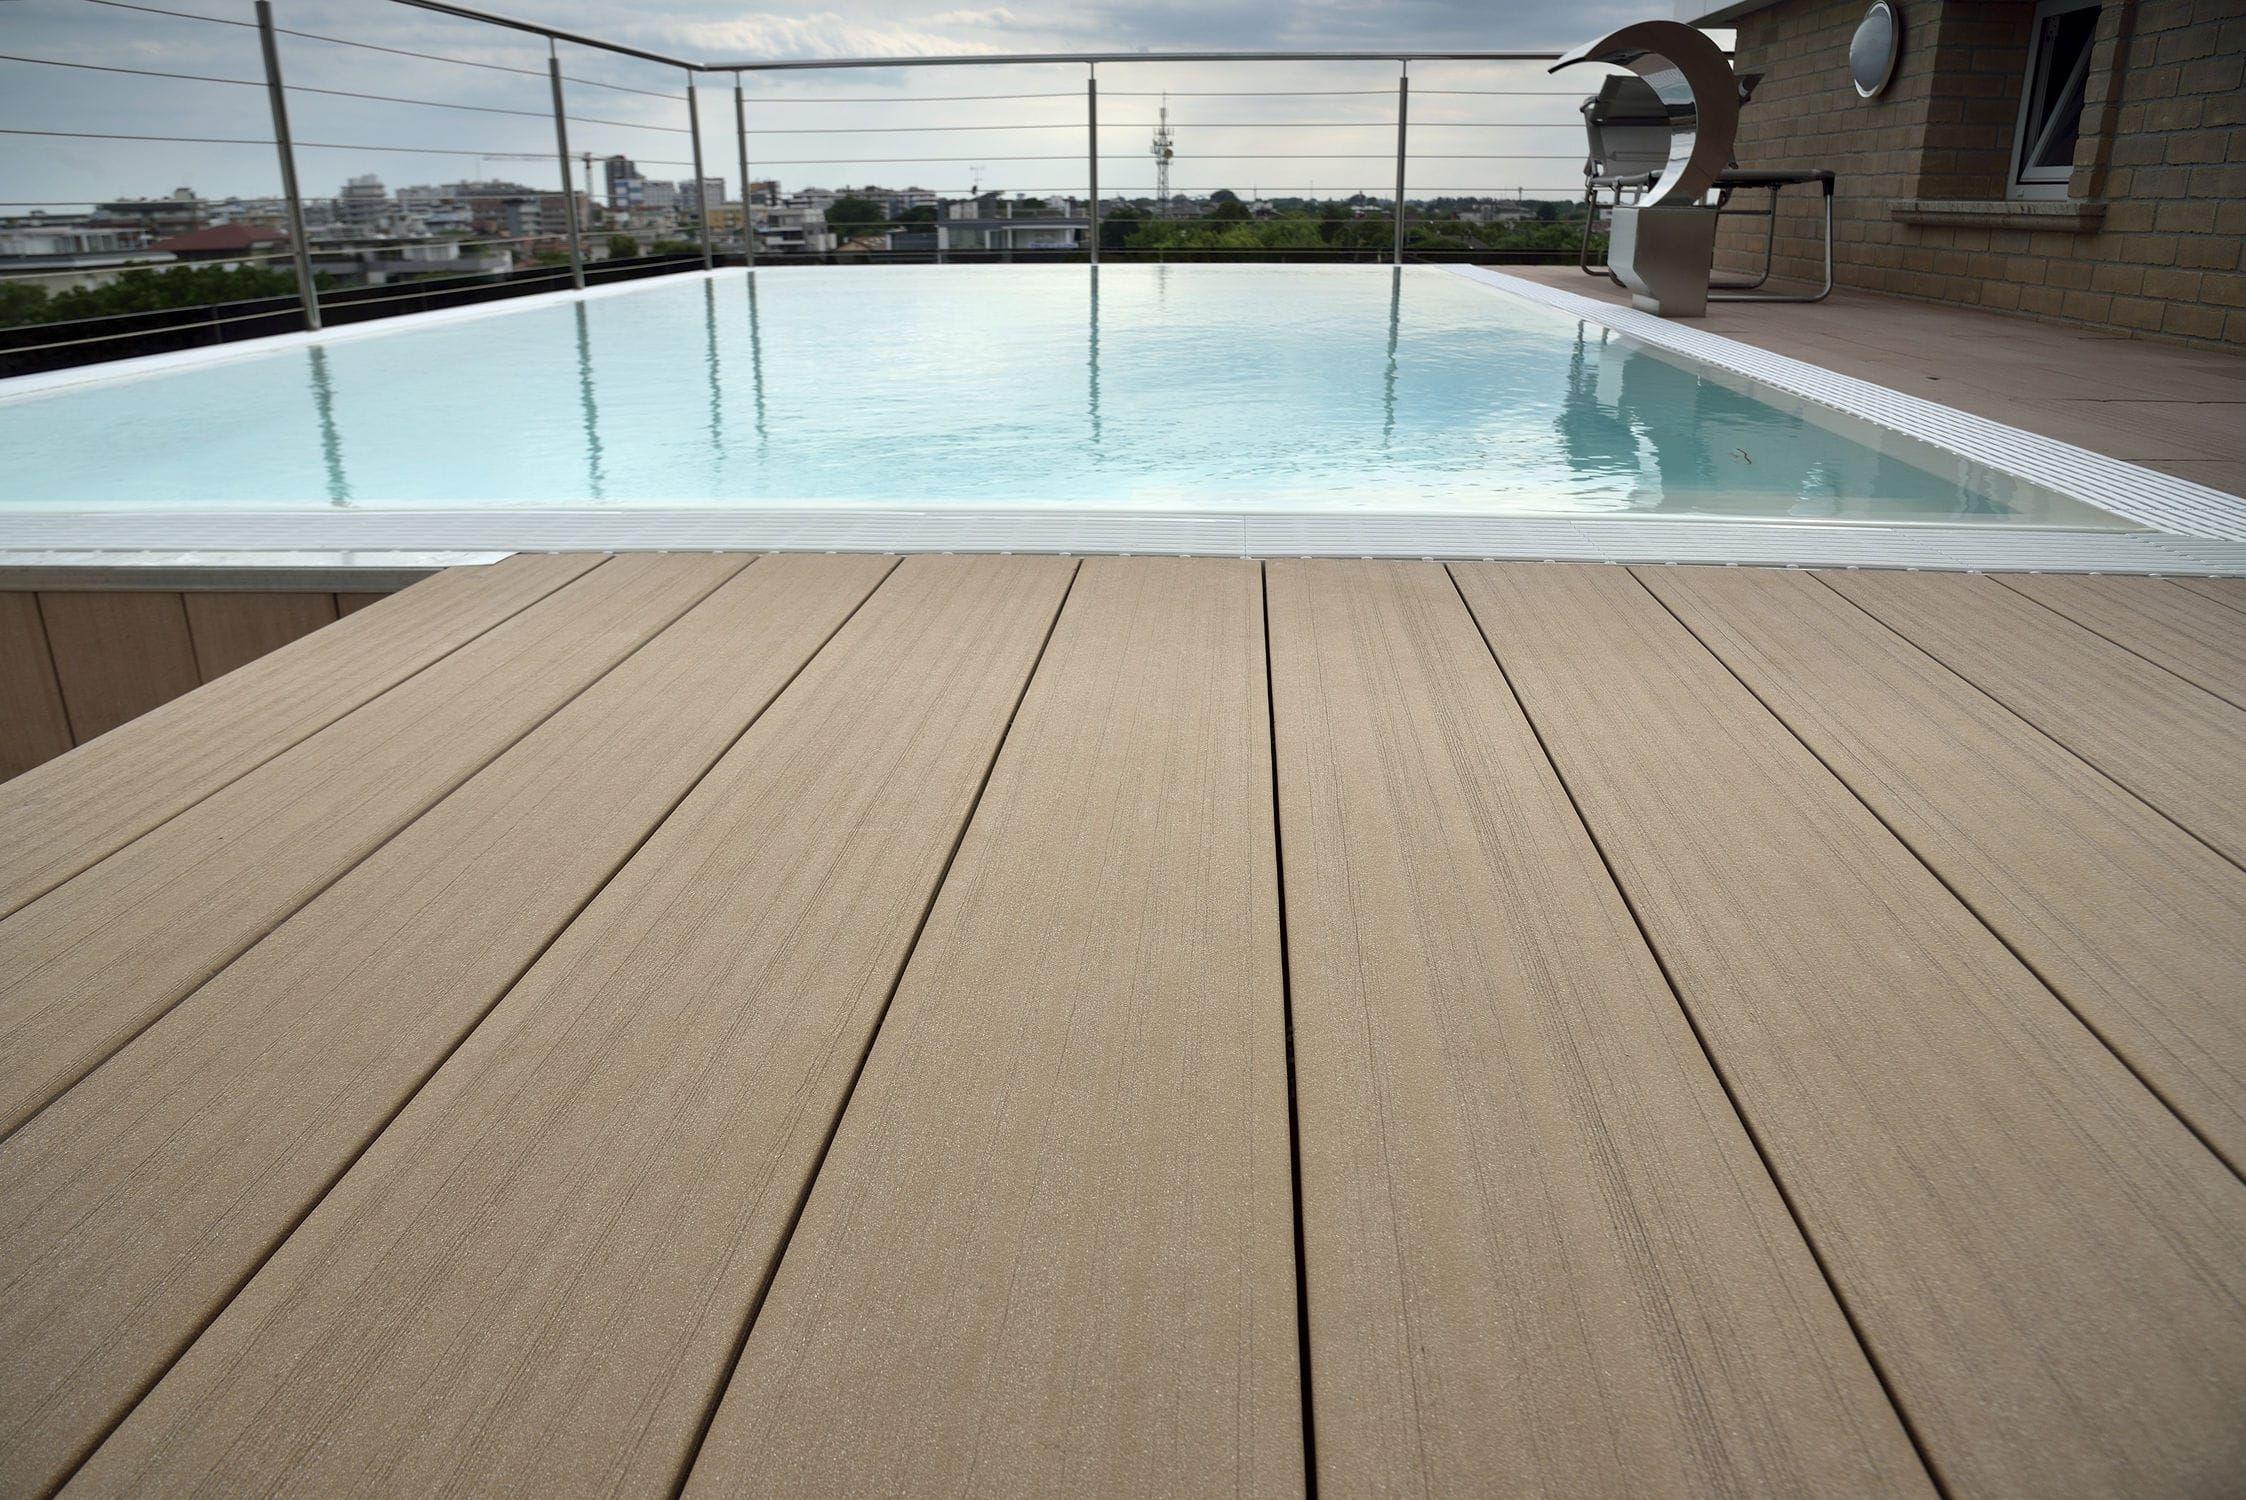 Cheapest Way To Fix A Deck Marine Flooring Materials Supply Turkey Composite Patio Decking Suppliers Engineered Wood Decking Decking Suppliers Wood Deck